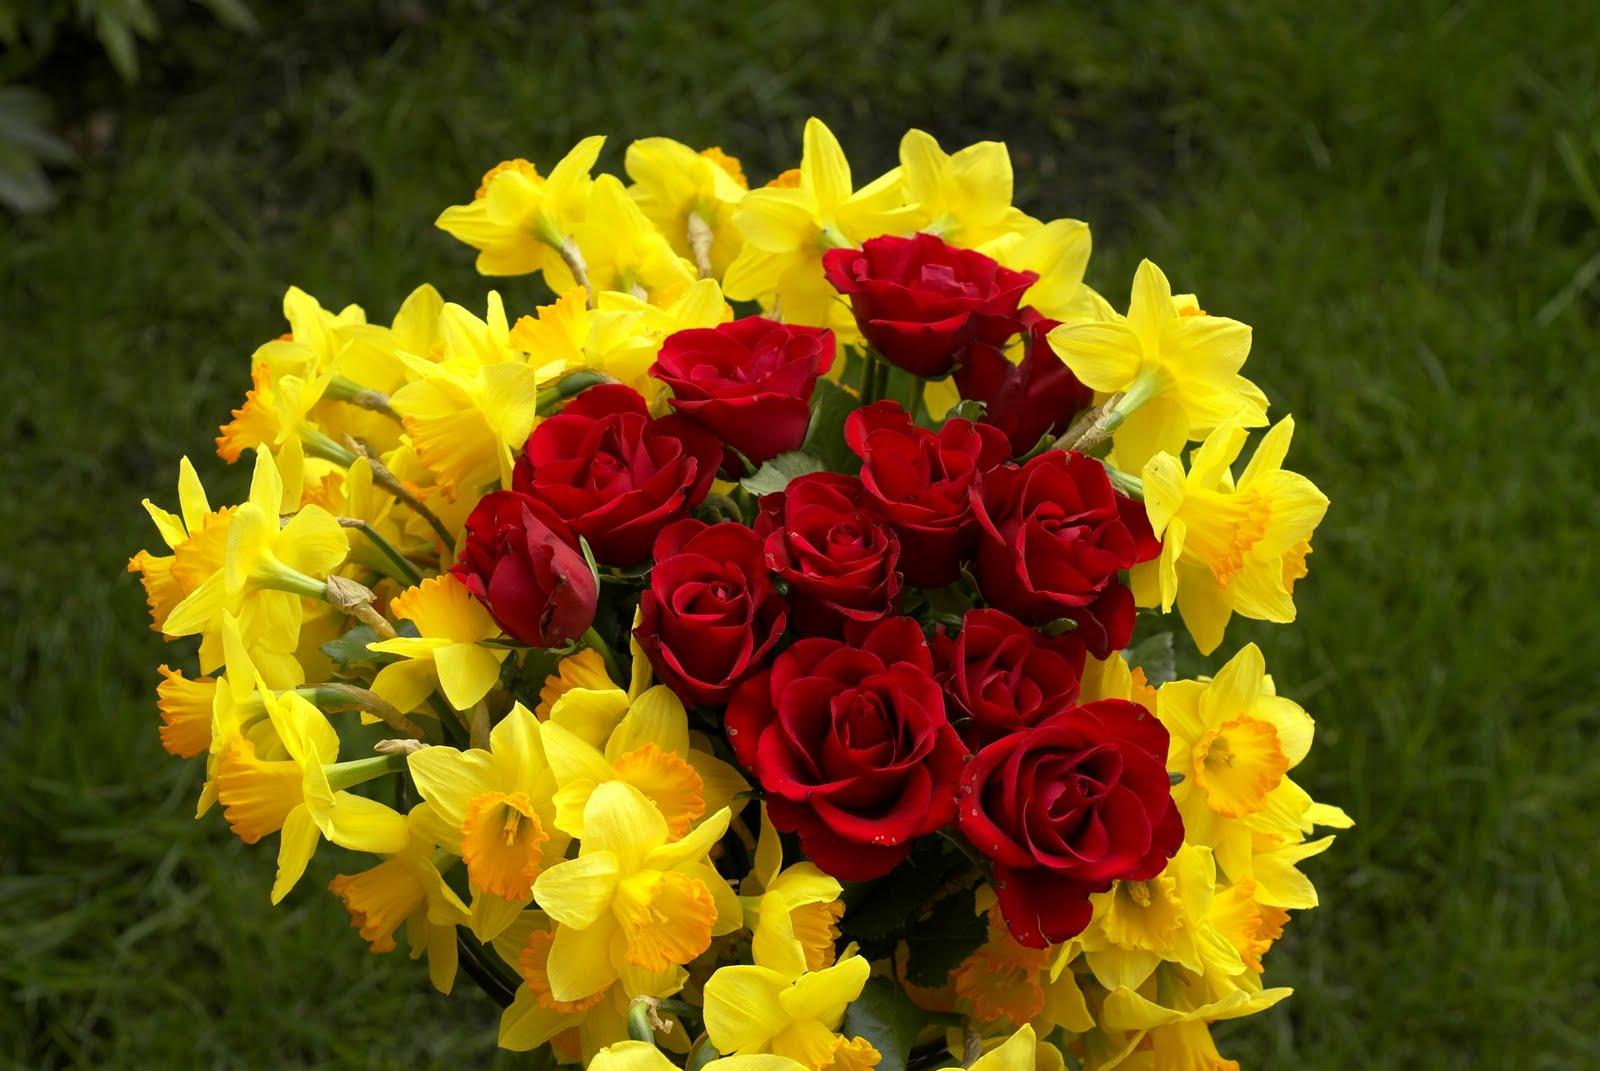 Download red rose flower high resolution widescreen 1600 x 1071 download red rose flower high resolution widescreen 1600 x 1071 mightylinksfo